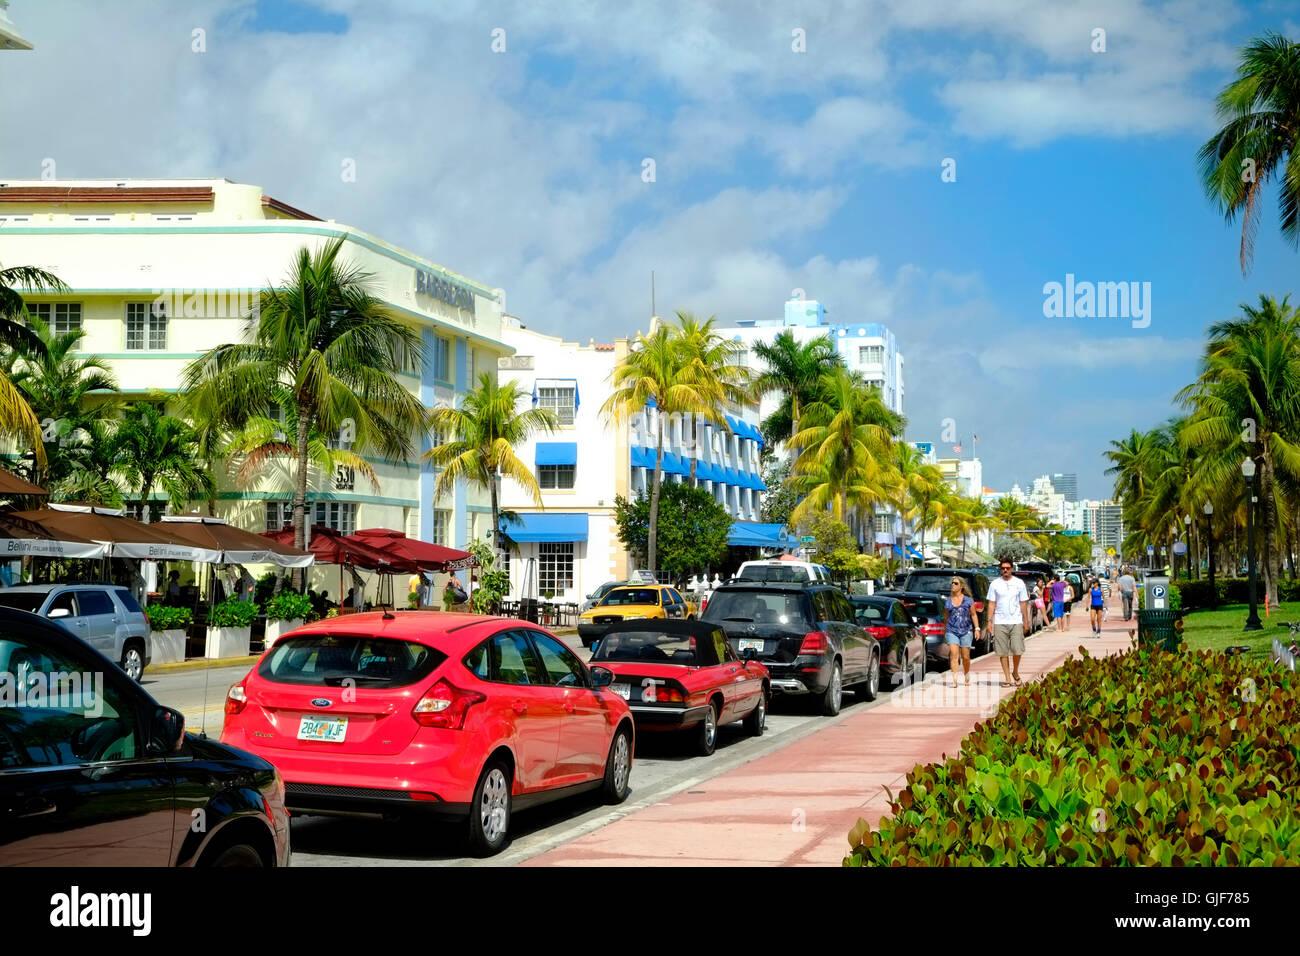 Ocean Drive, Miami, Florida, USA - Stock Image